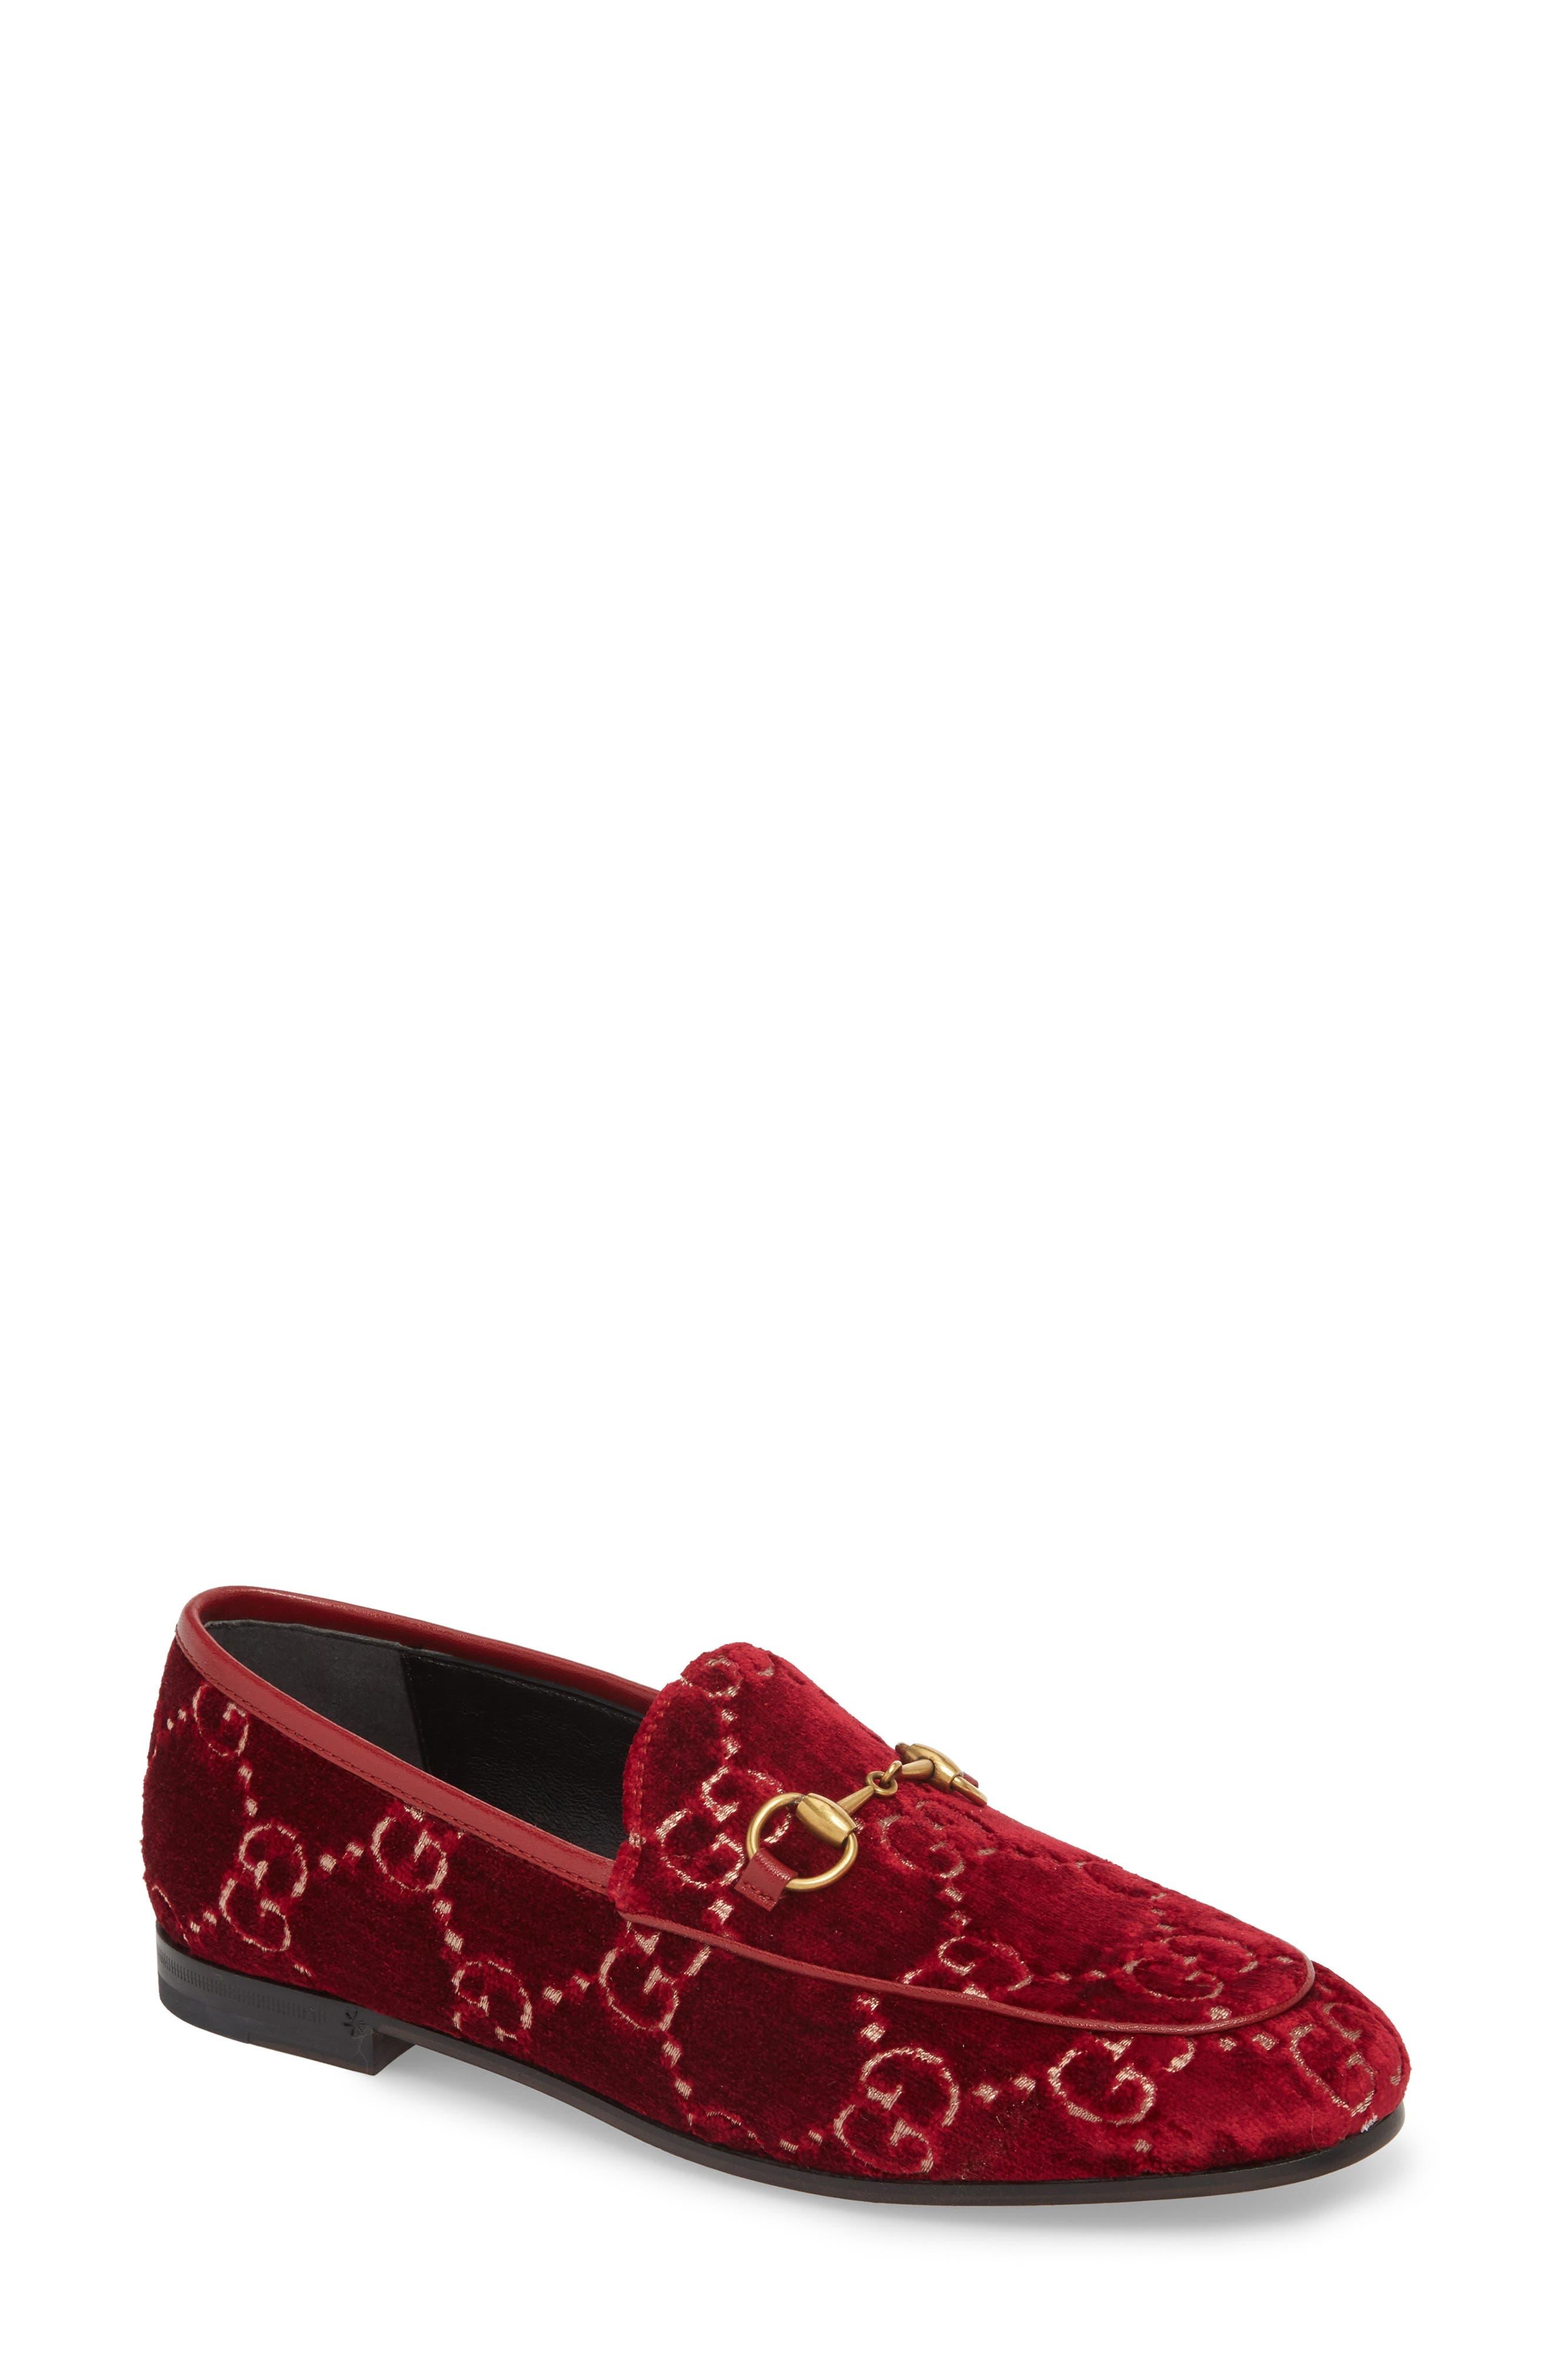 Gucci Jordaan Loafer - Red